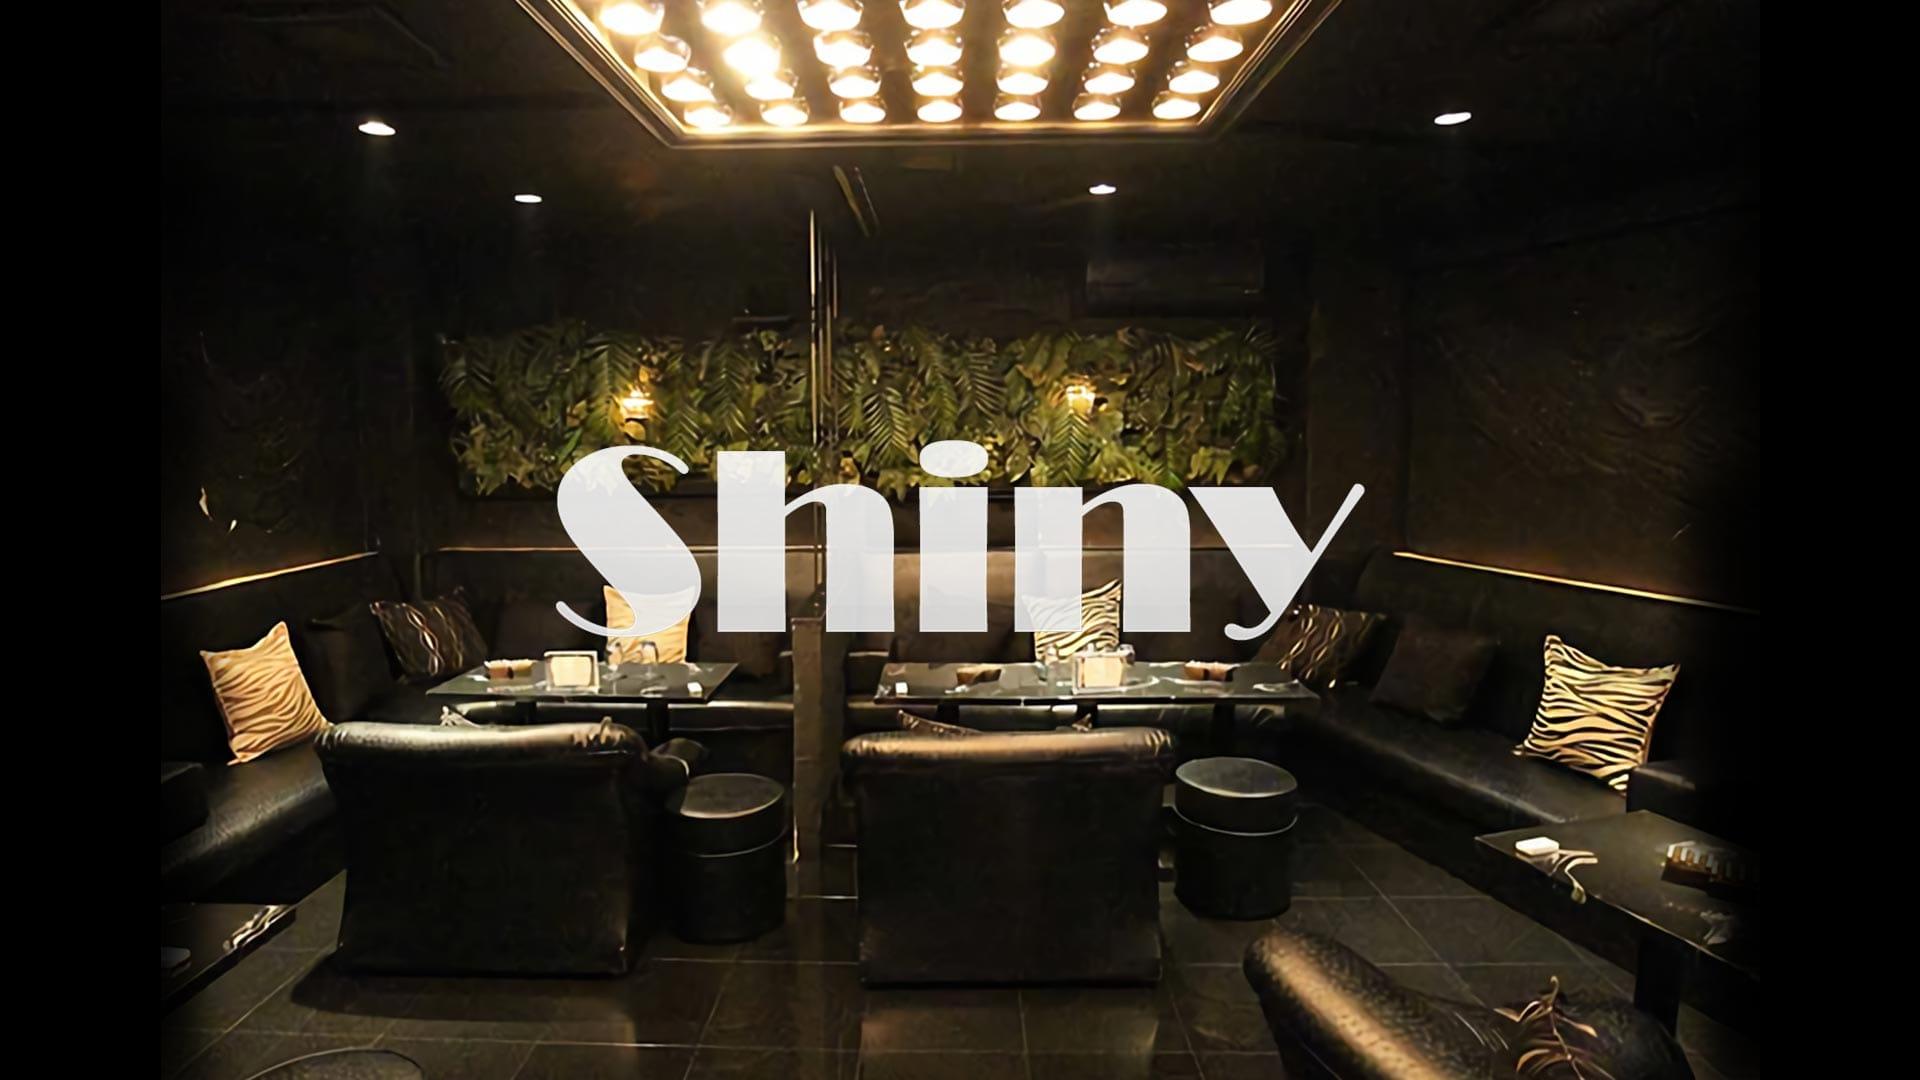 Shiny(シャイニー) 高円寺キャバクラ TOP画像